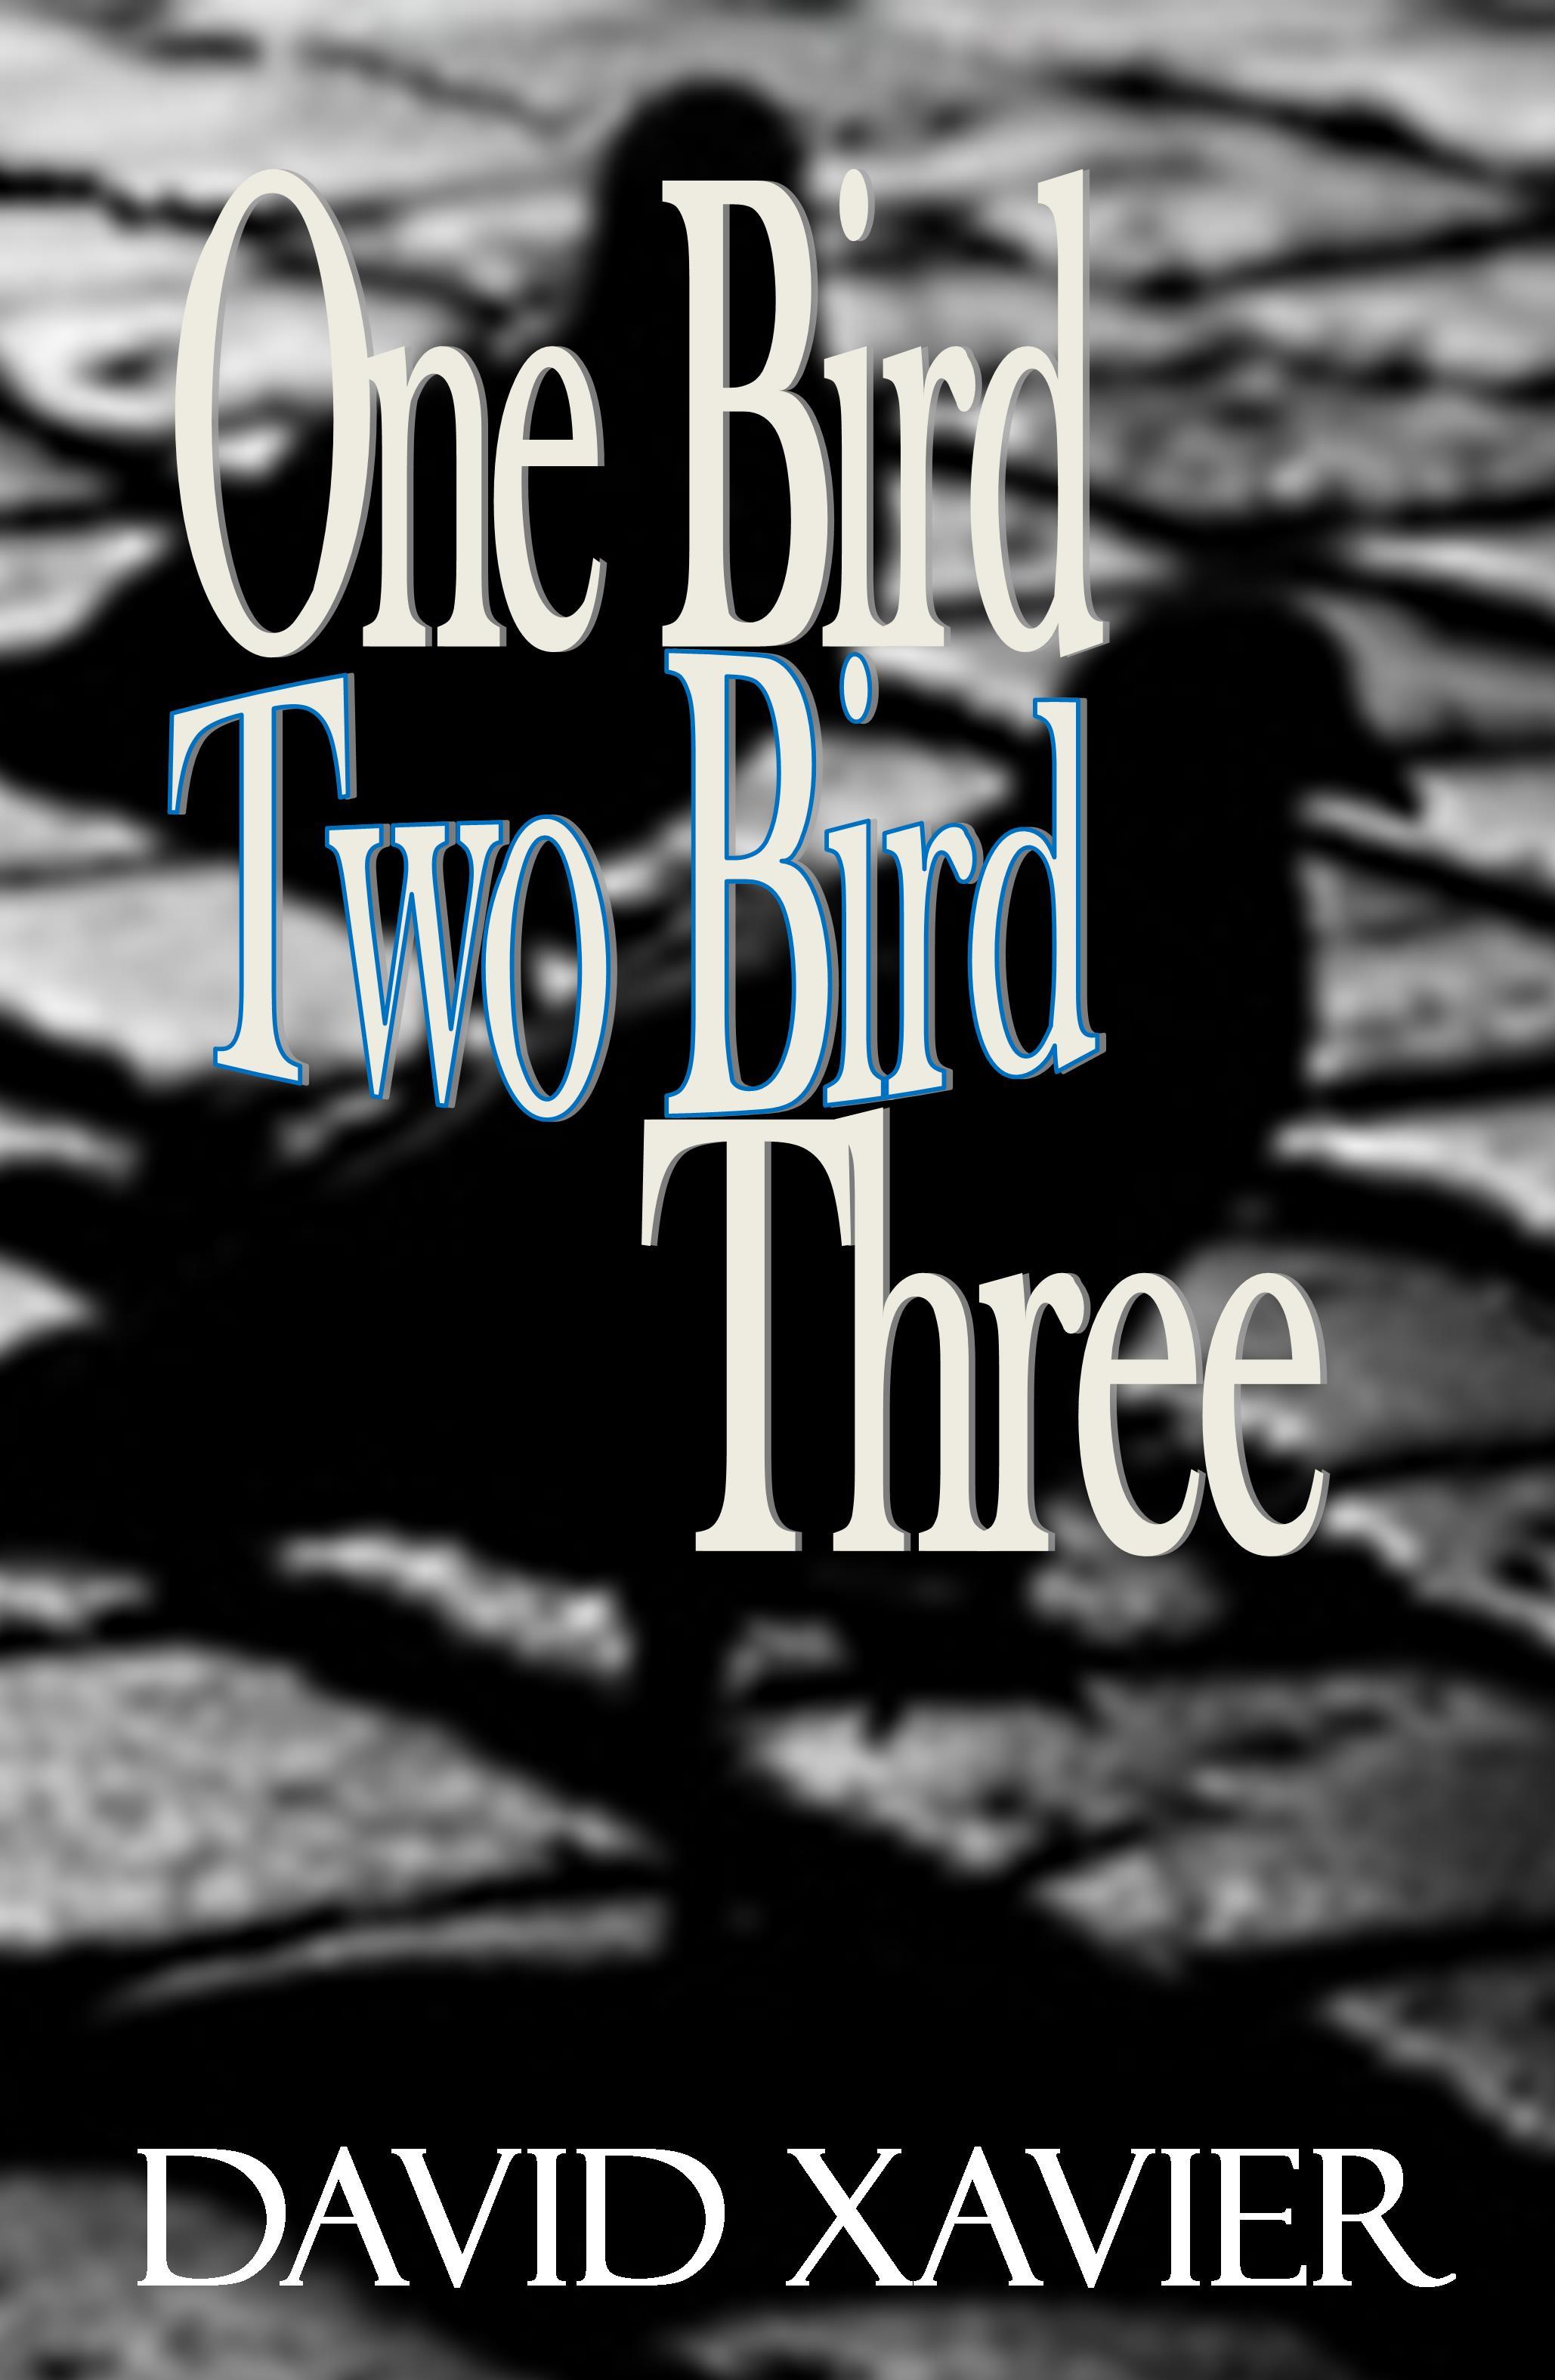 David Xavier - One Bird, Two Bird, Three